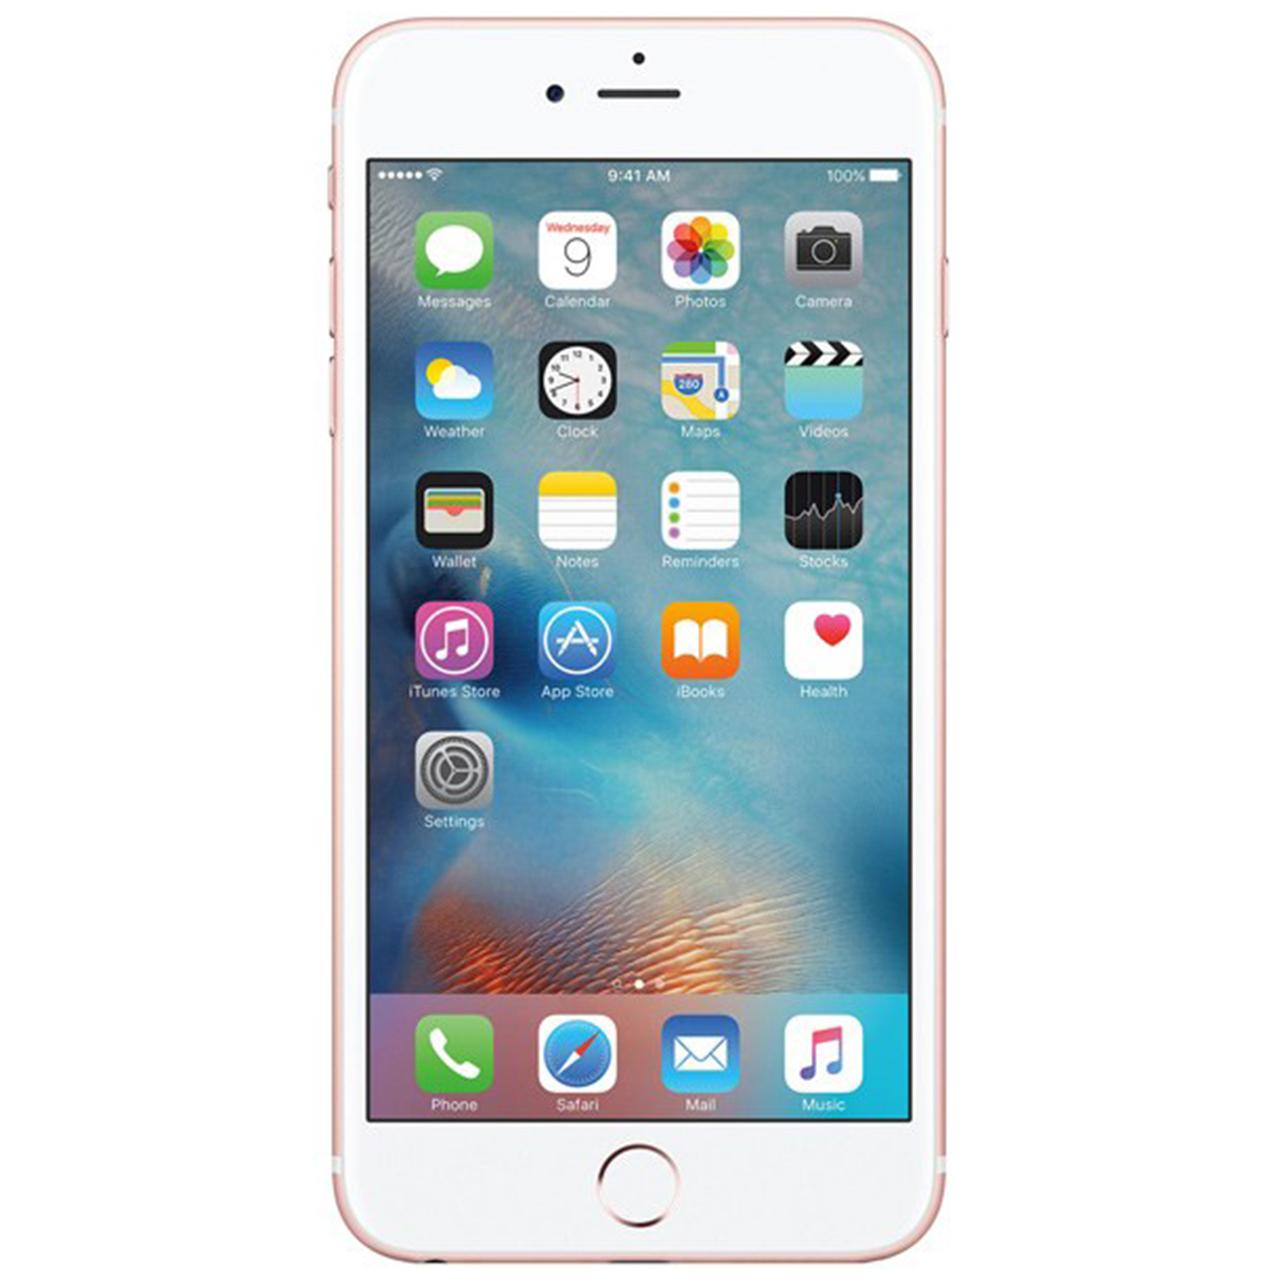 "<span style="""">گوشی موبایل اپل مدل iPhone 6s Plus – ظرفیت ۱۶ گیگابایت                             Apple iPhone 6s Plus 16GB Mobile Phone</span>"